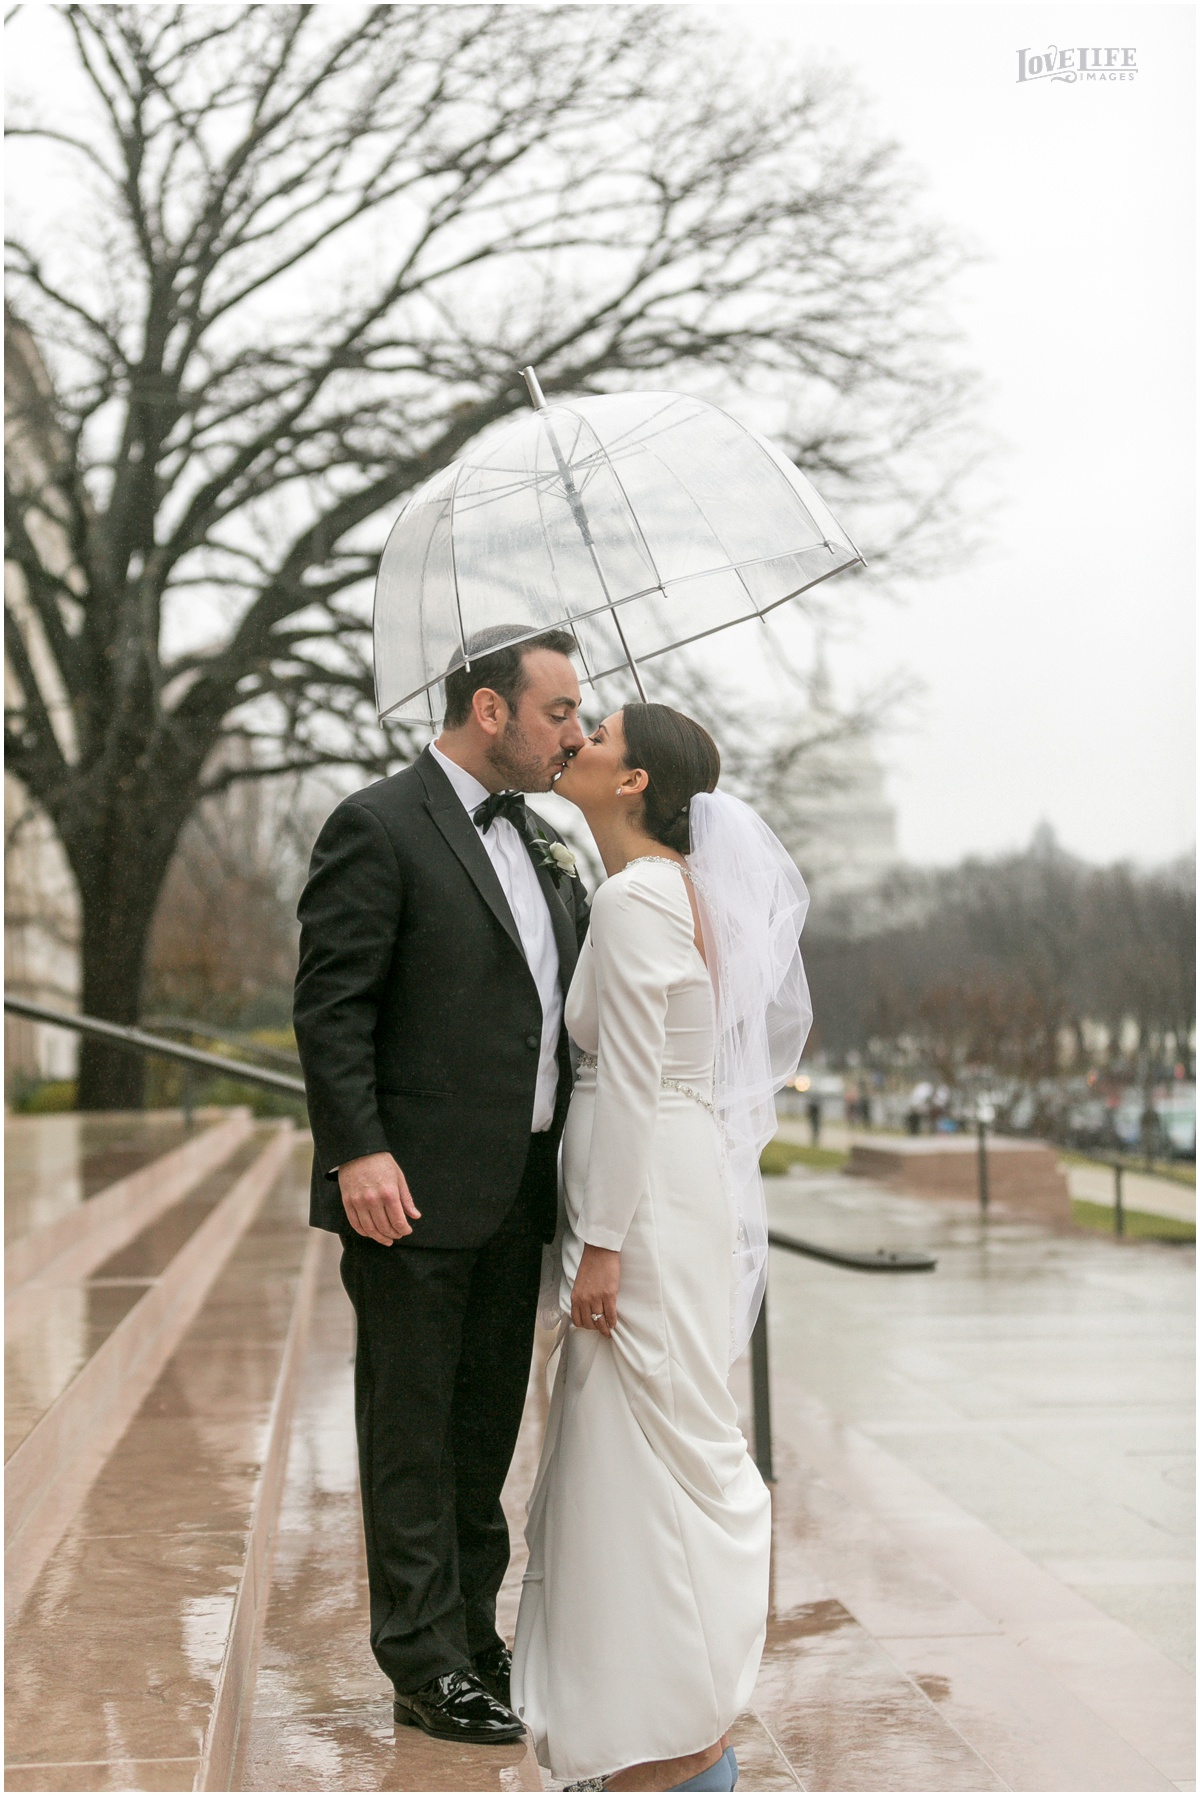 Winter District Winery Wedding bride groom kiss in rain capitol building.JPG